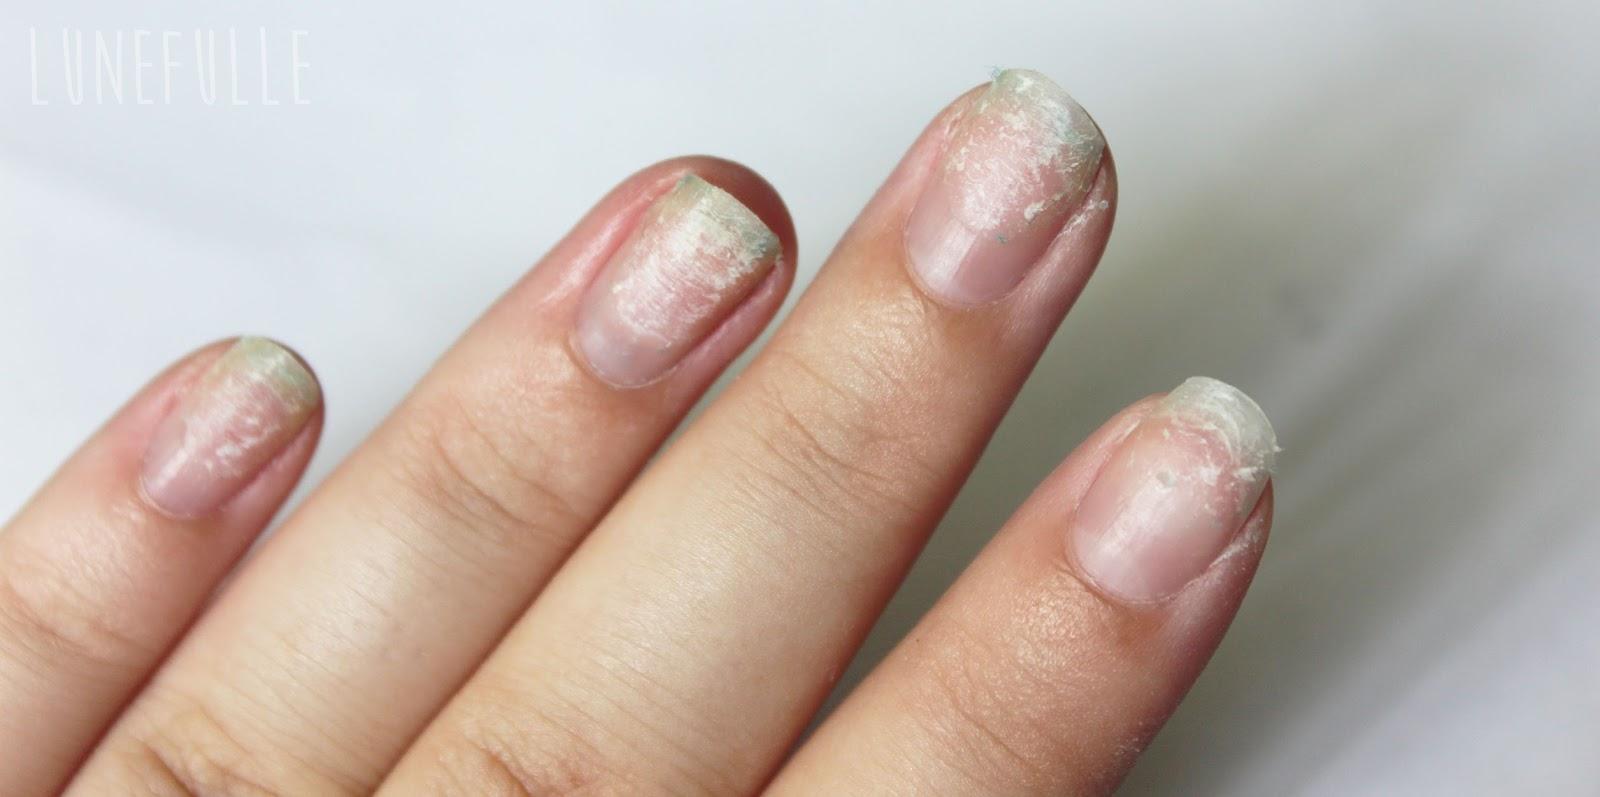 Lunefulle le blog ongles en gel mon exp rience mon avis - Ongle gel beige ...